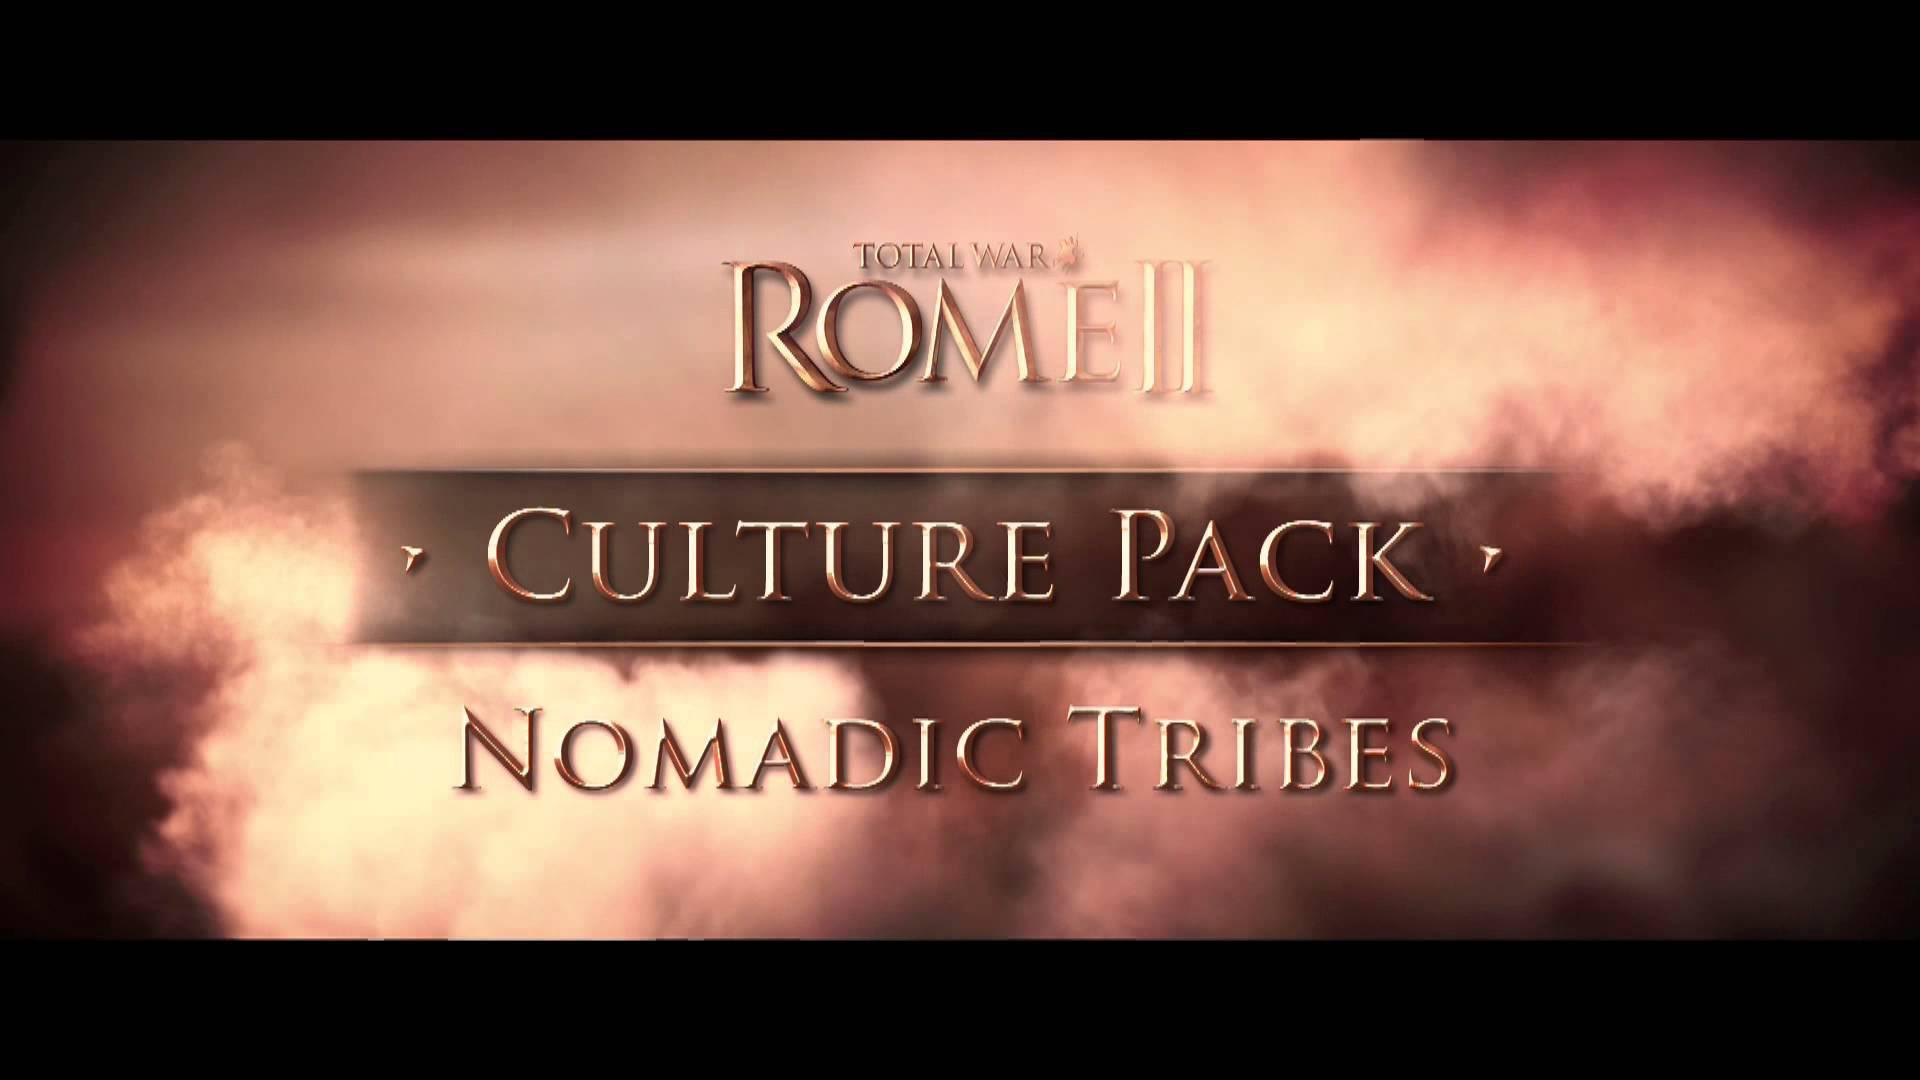 DLC-ul Nomadic Tribes pentru Total War: Rome 2 disponibil gratuit